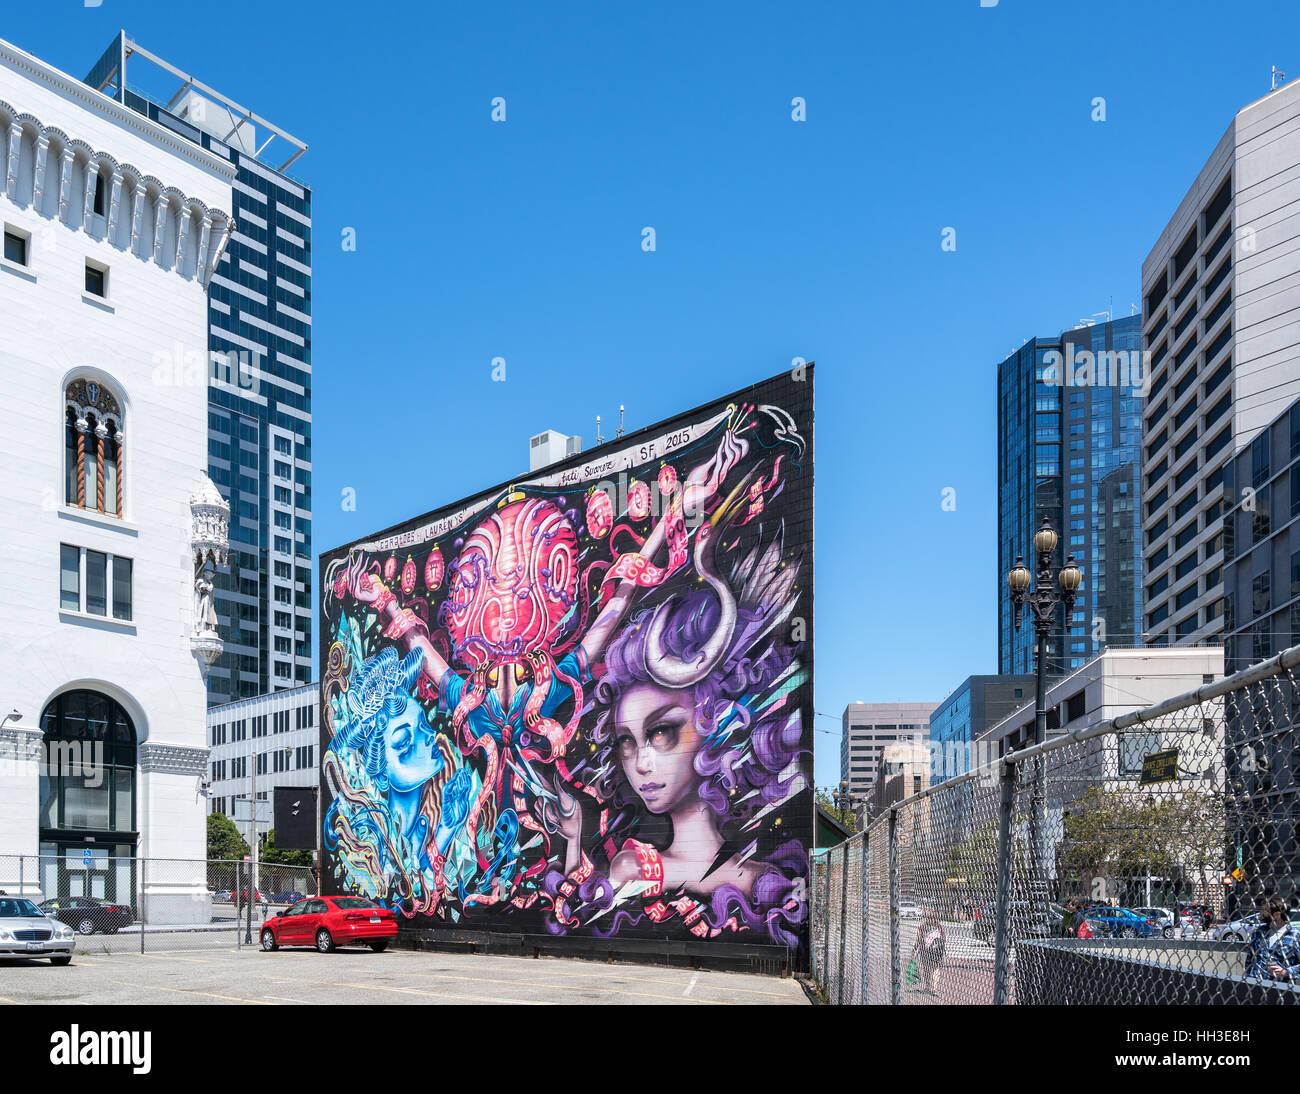 Street art in San Francisco, California, United States of America, North America Stock Photo